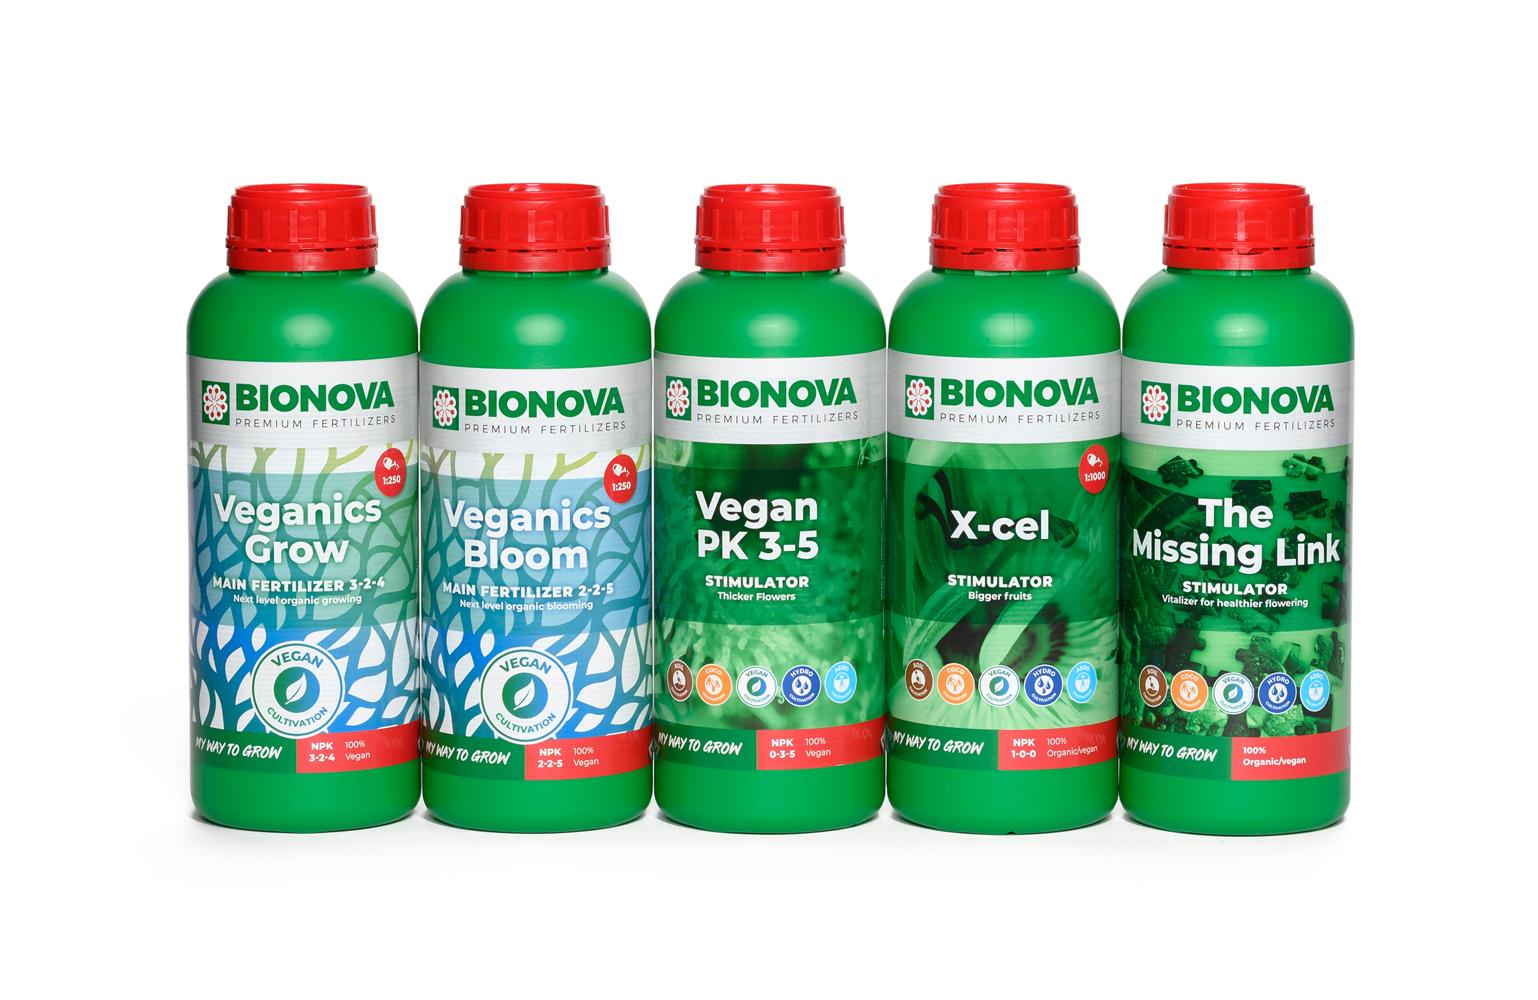 Bionova Veganics Exploration Pack